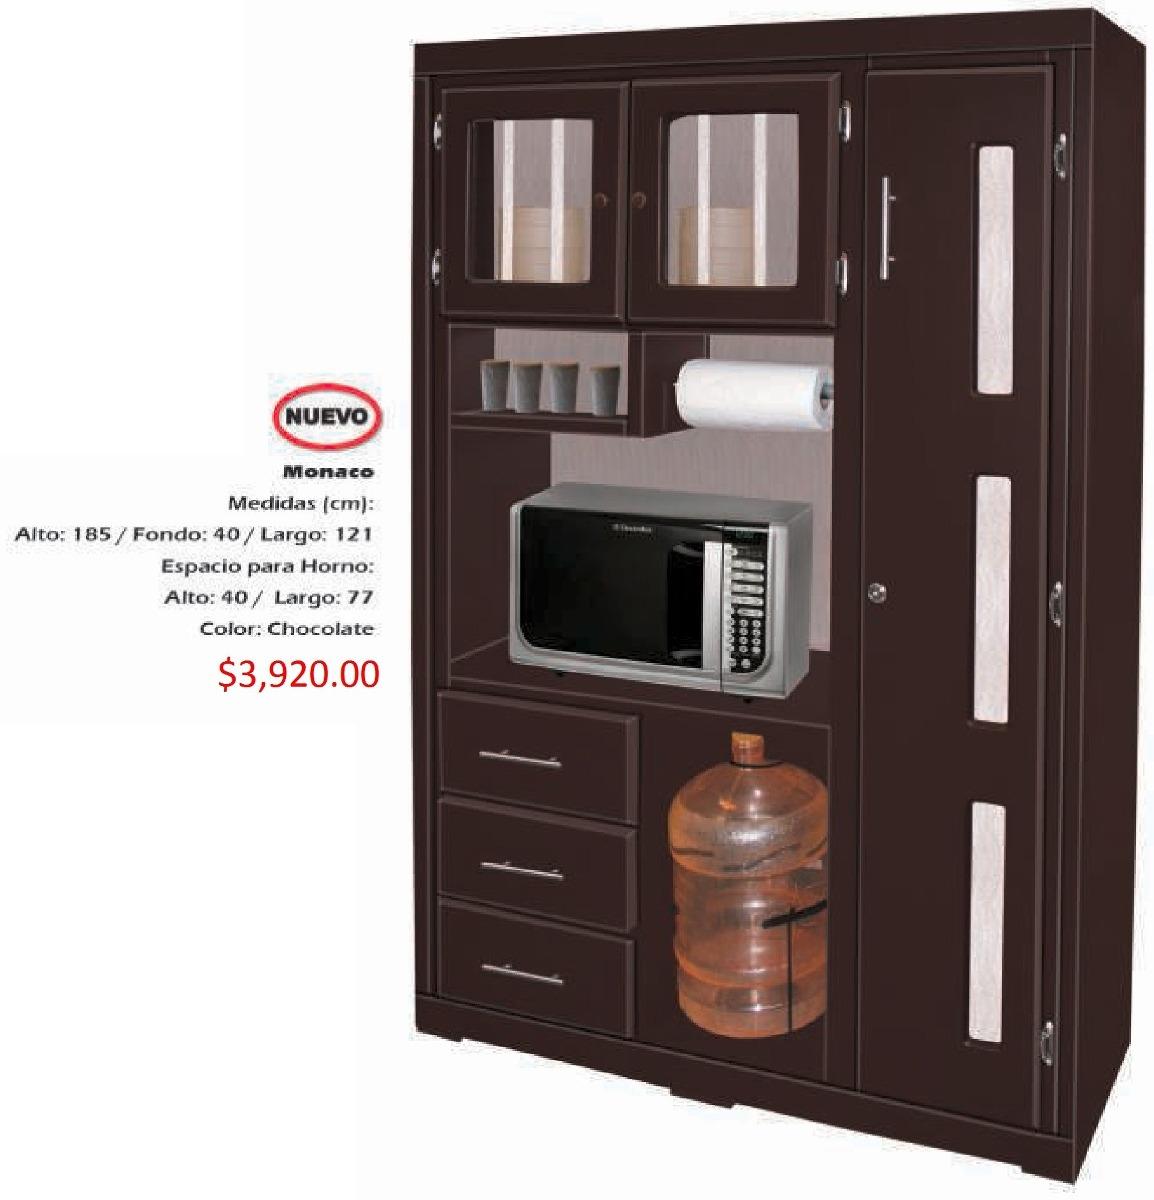 Mueble para cocina modelo monaco 3 en mercado libre - Muebles alacenas para cocina ...